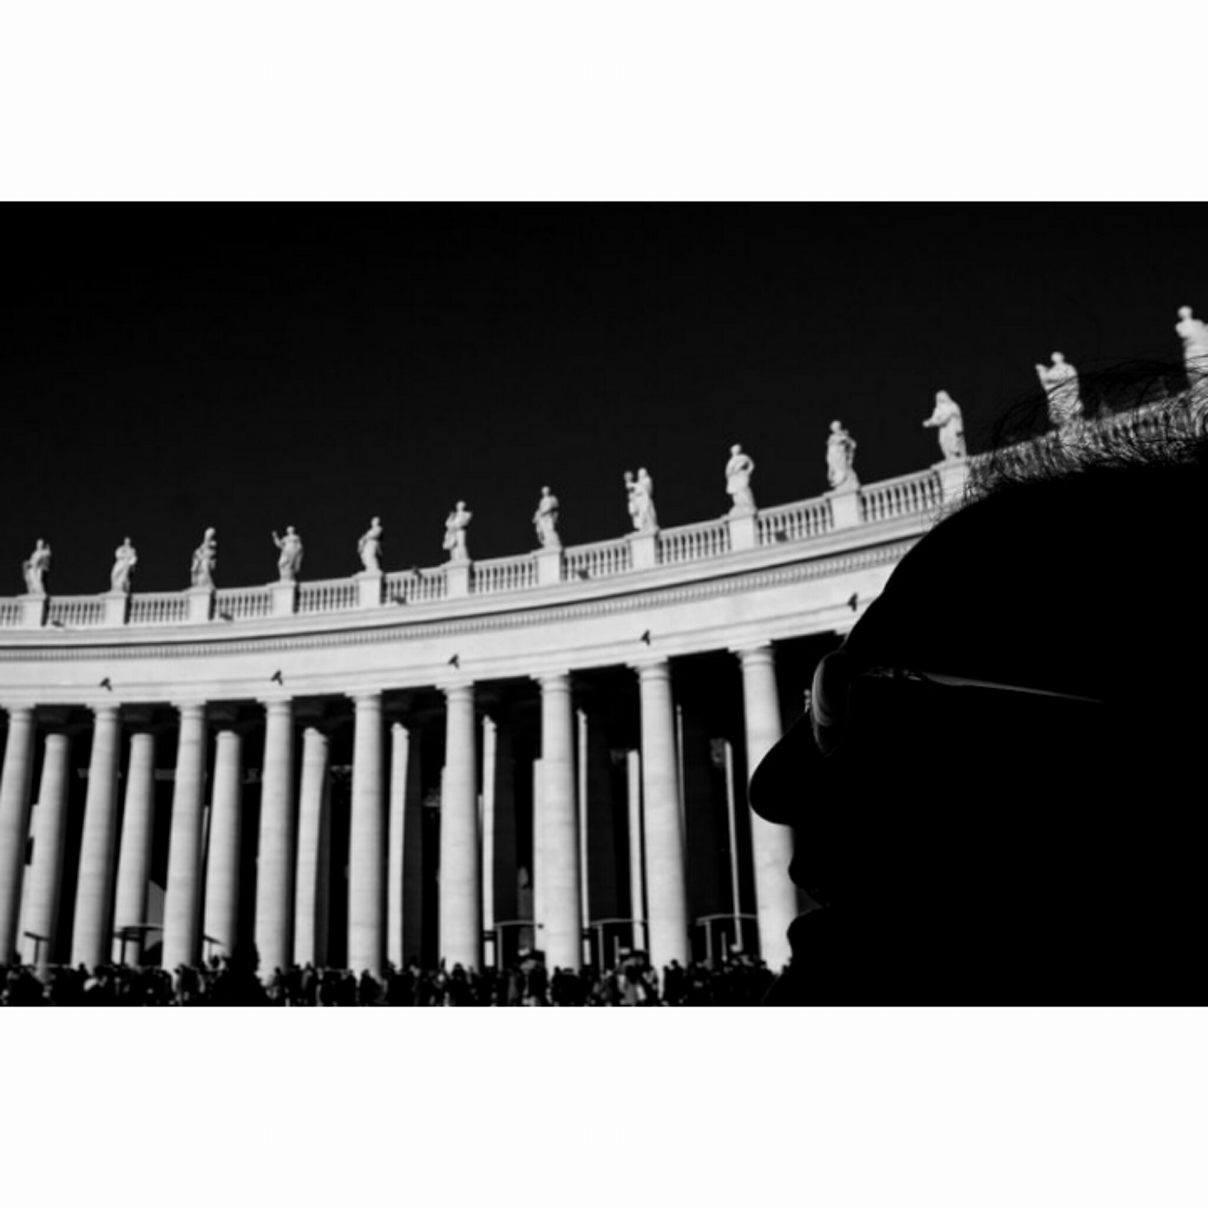 Tribute to Eric Kim - Vatican City - December 2016